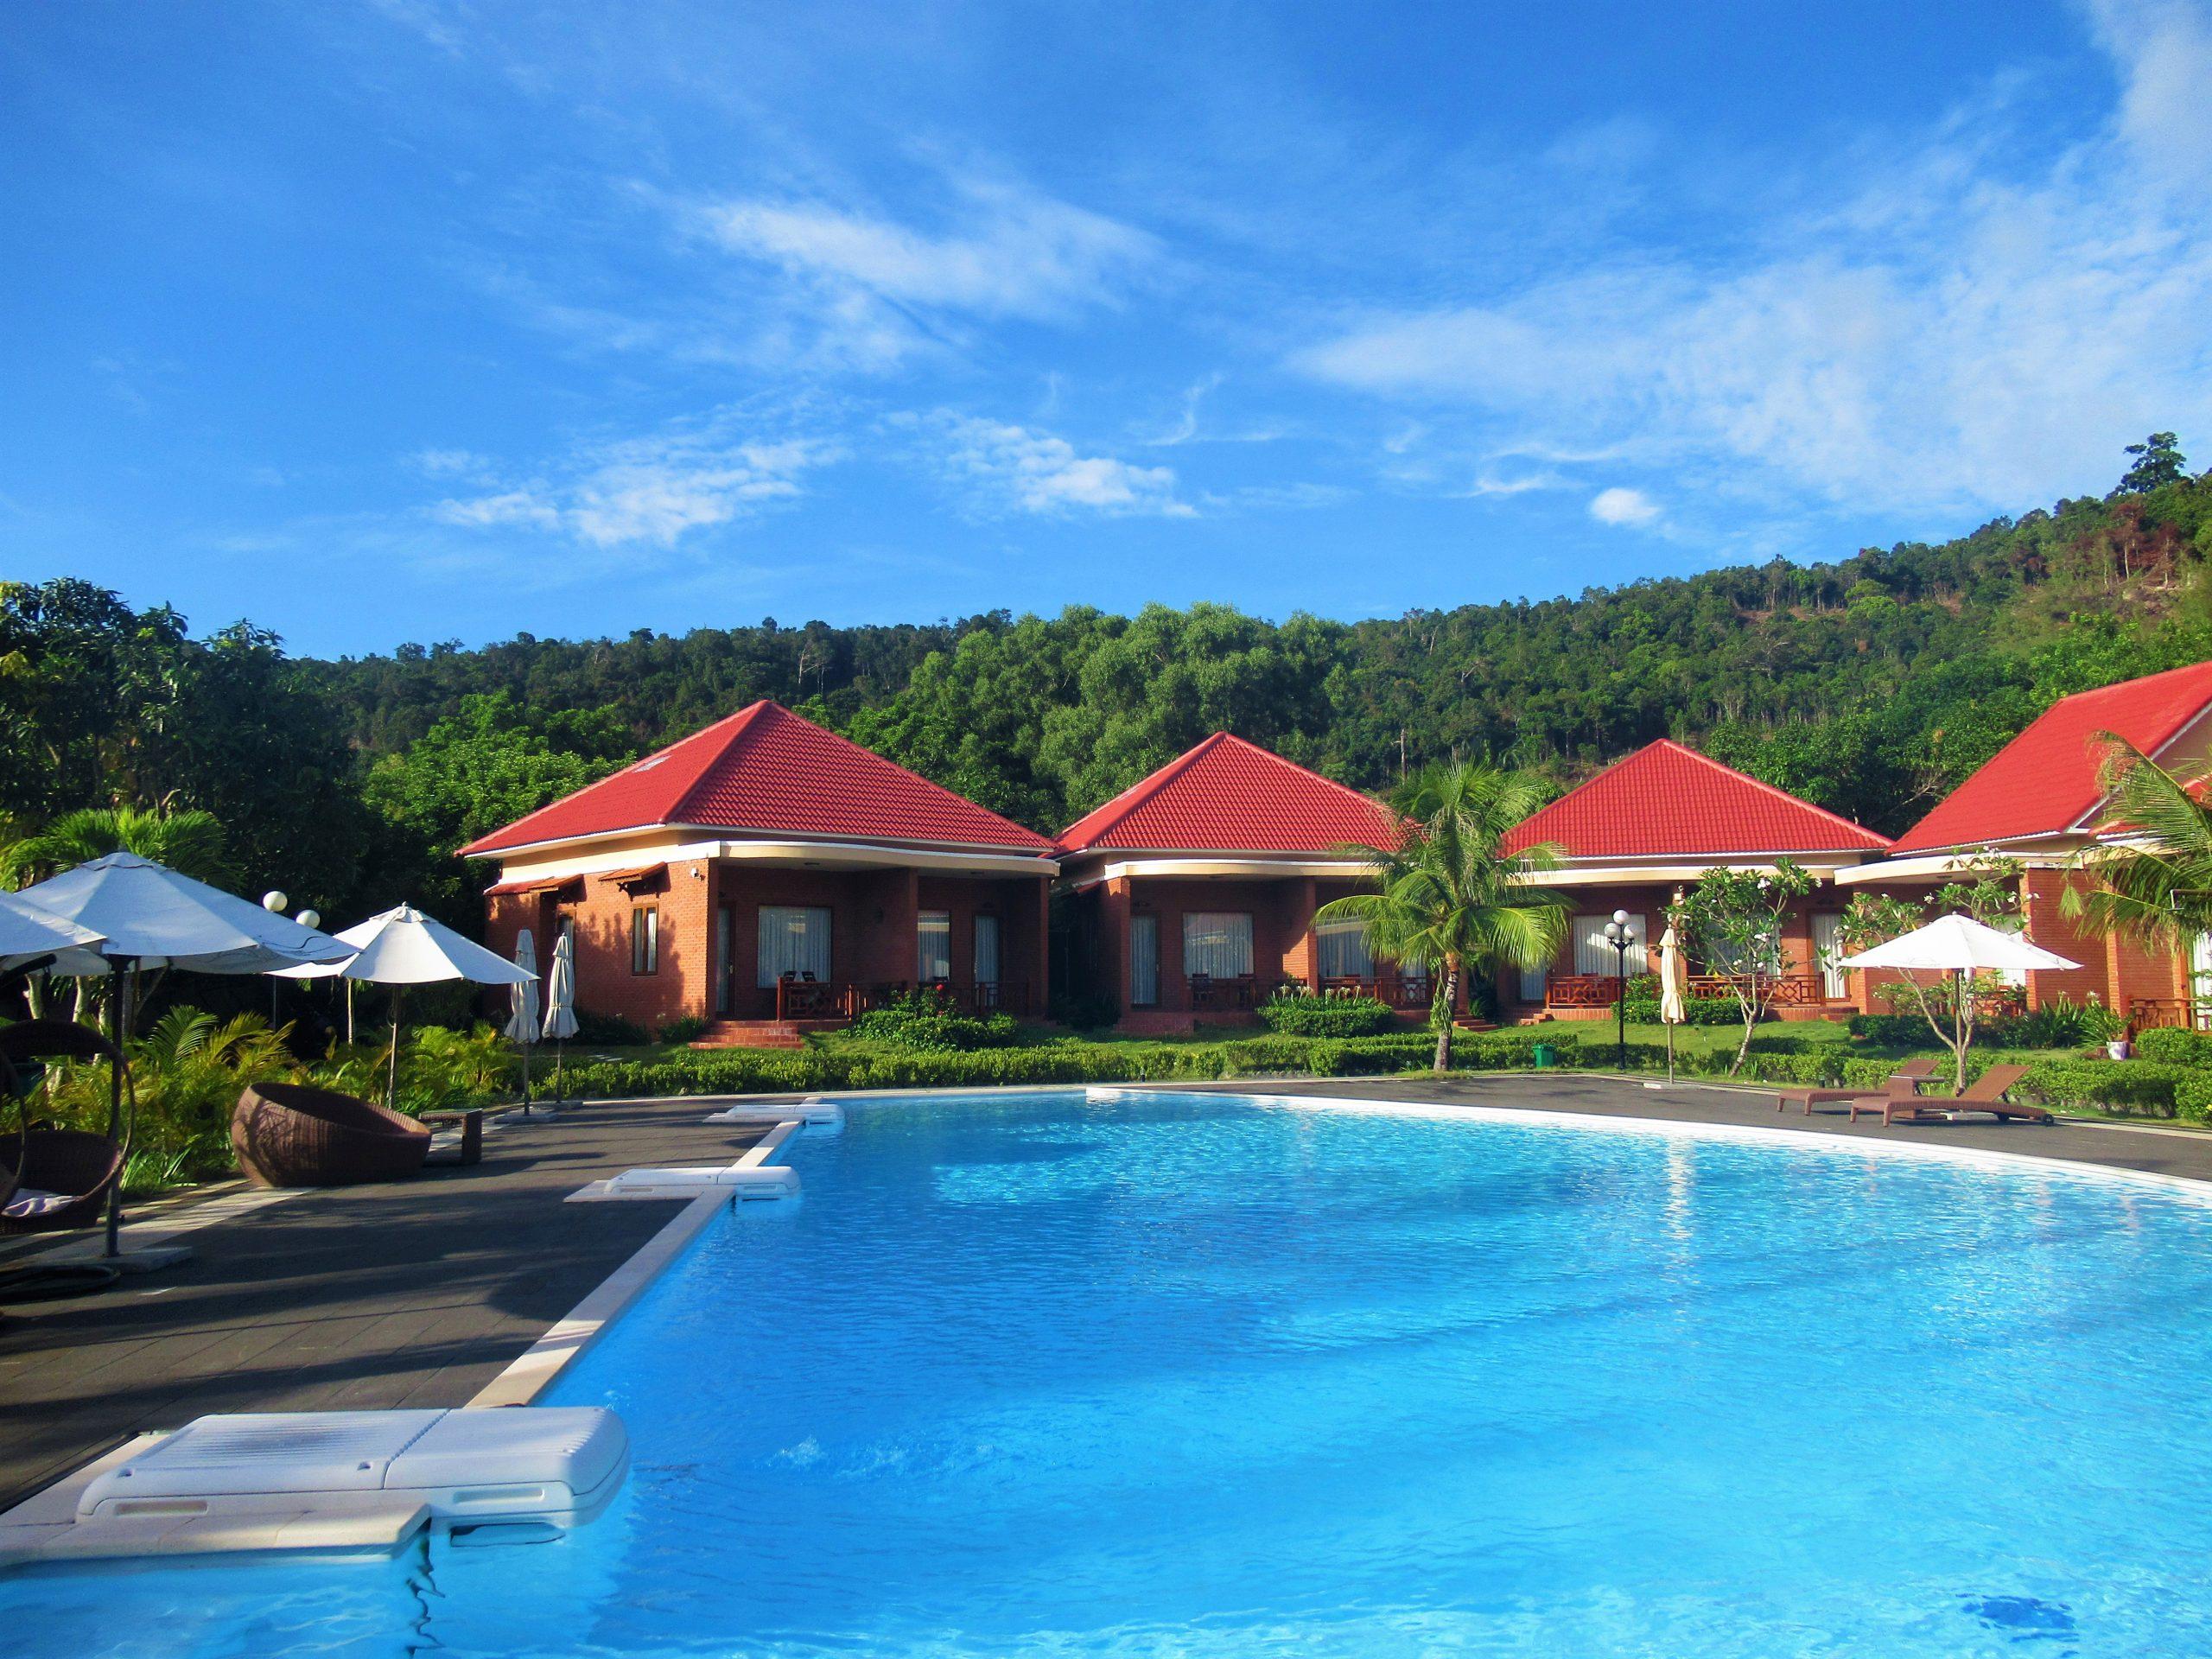 Swimming pool, Gold Coast Resort, Phu Quoc Island, Vietnam